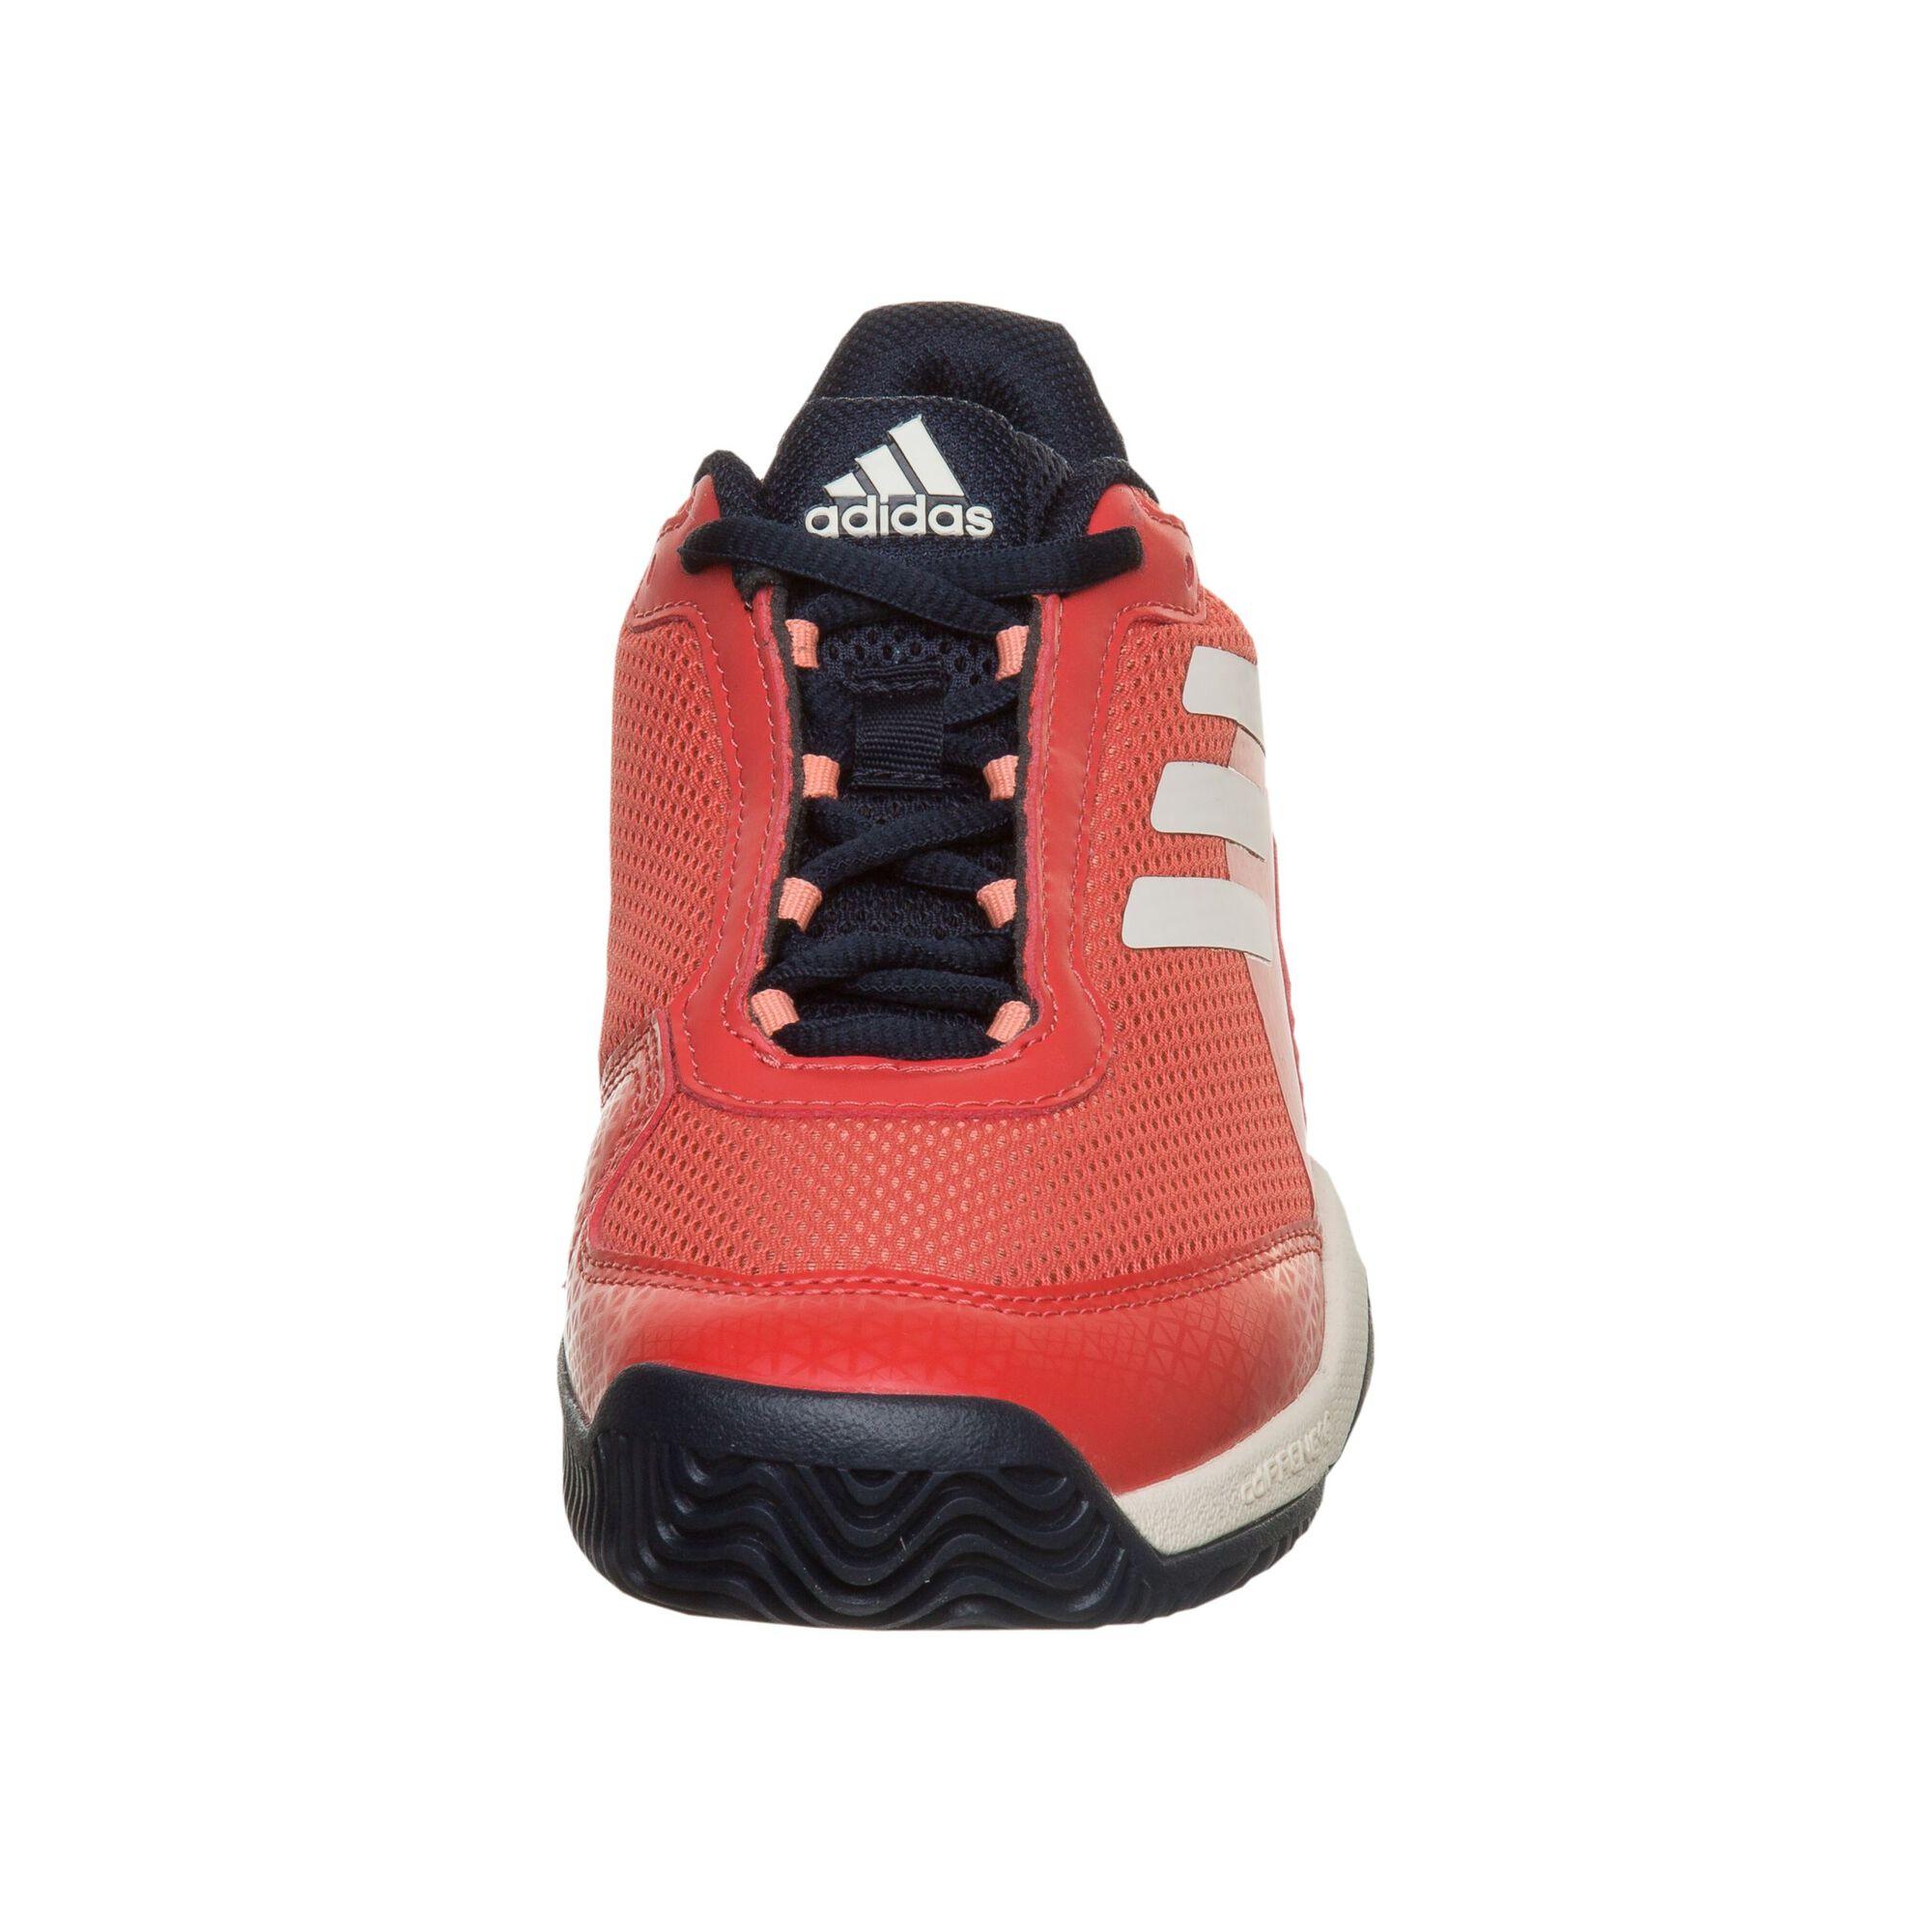 ecea0eaf483 adidas Barricade Club XJ Allcourt-sko Børn - Rød, Hvid køb online ...